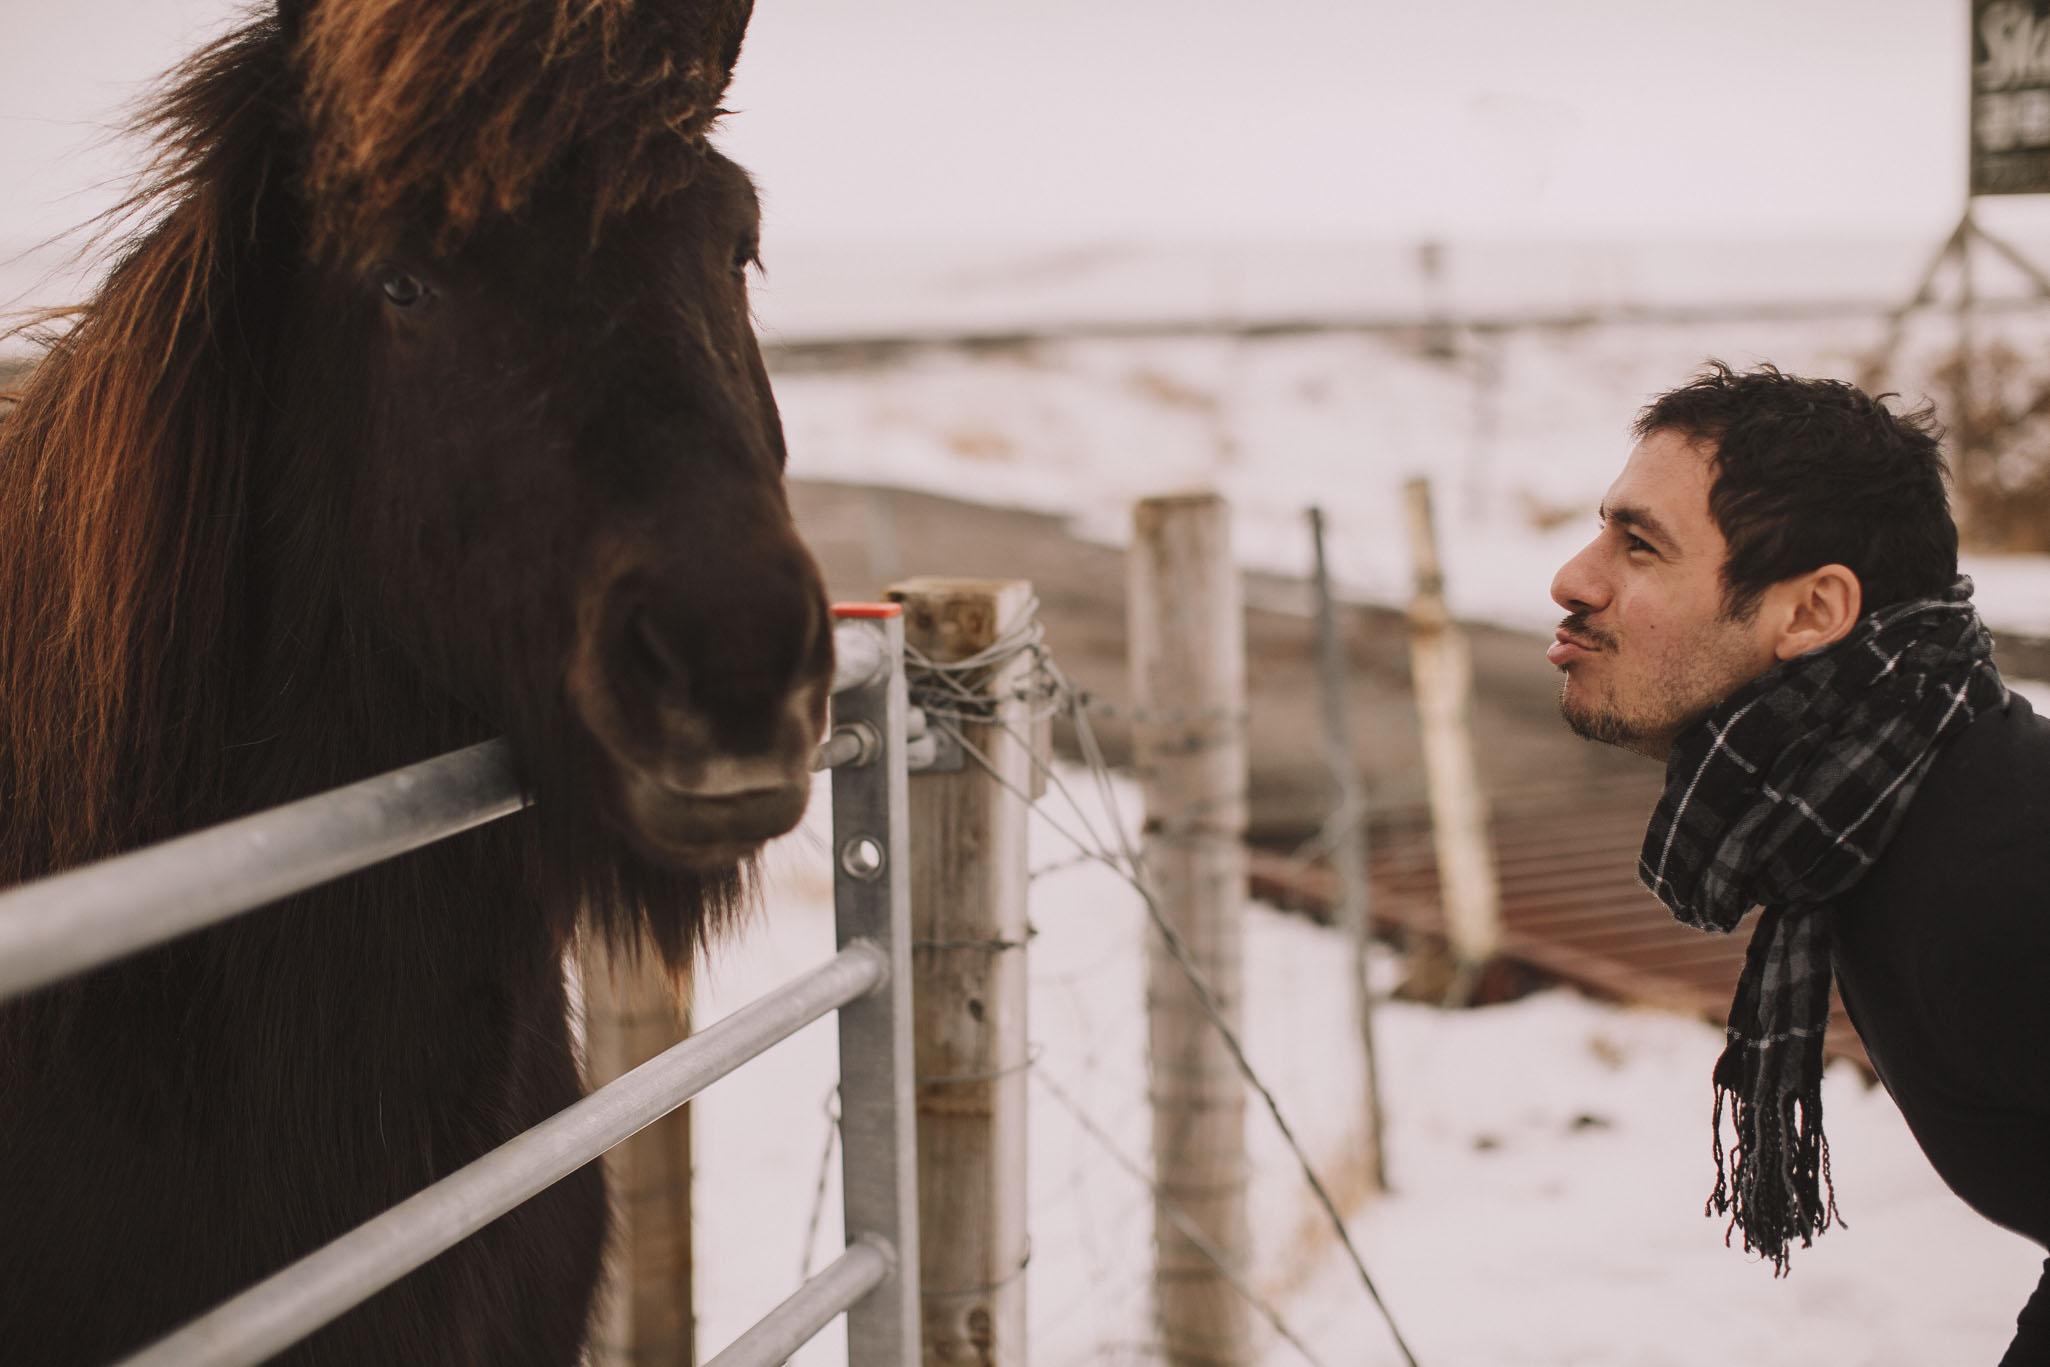 Road-trip-Islande-Iceland-Voyage-Travel-Portrait-Jérémy-Boyer-Geysir-Geysers-Horse-snow-ice-Gullfoss-4.jpg